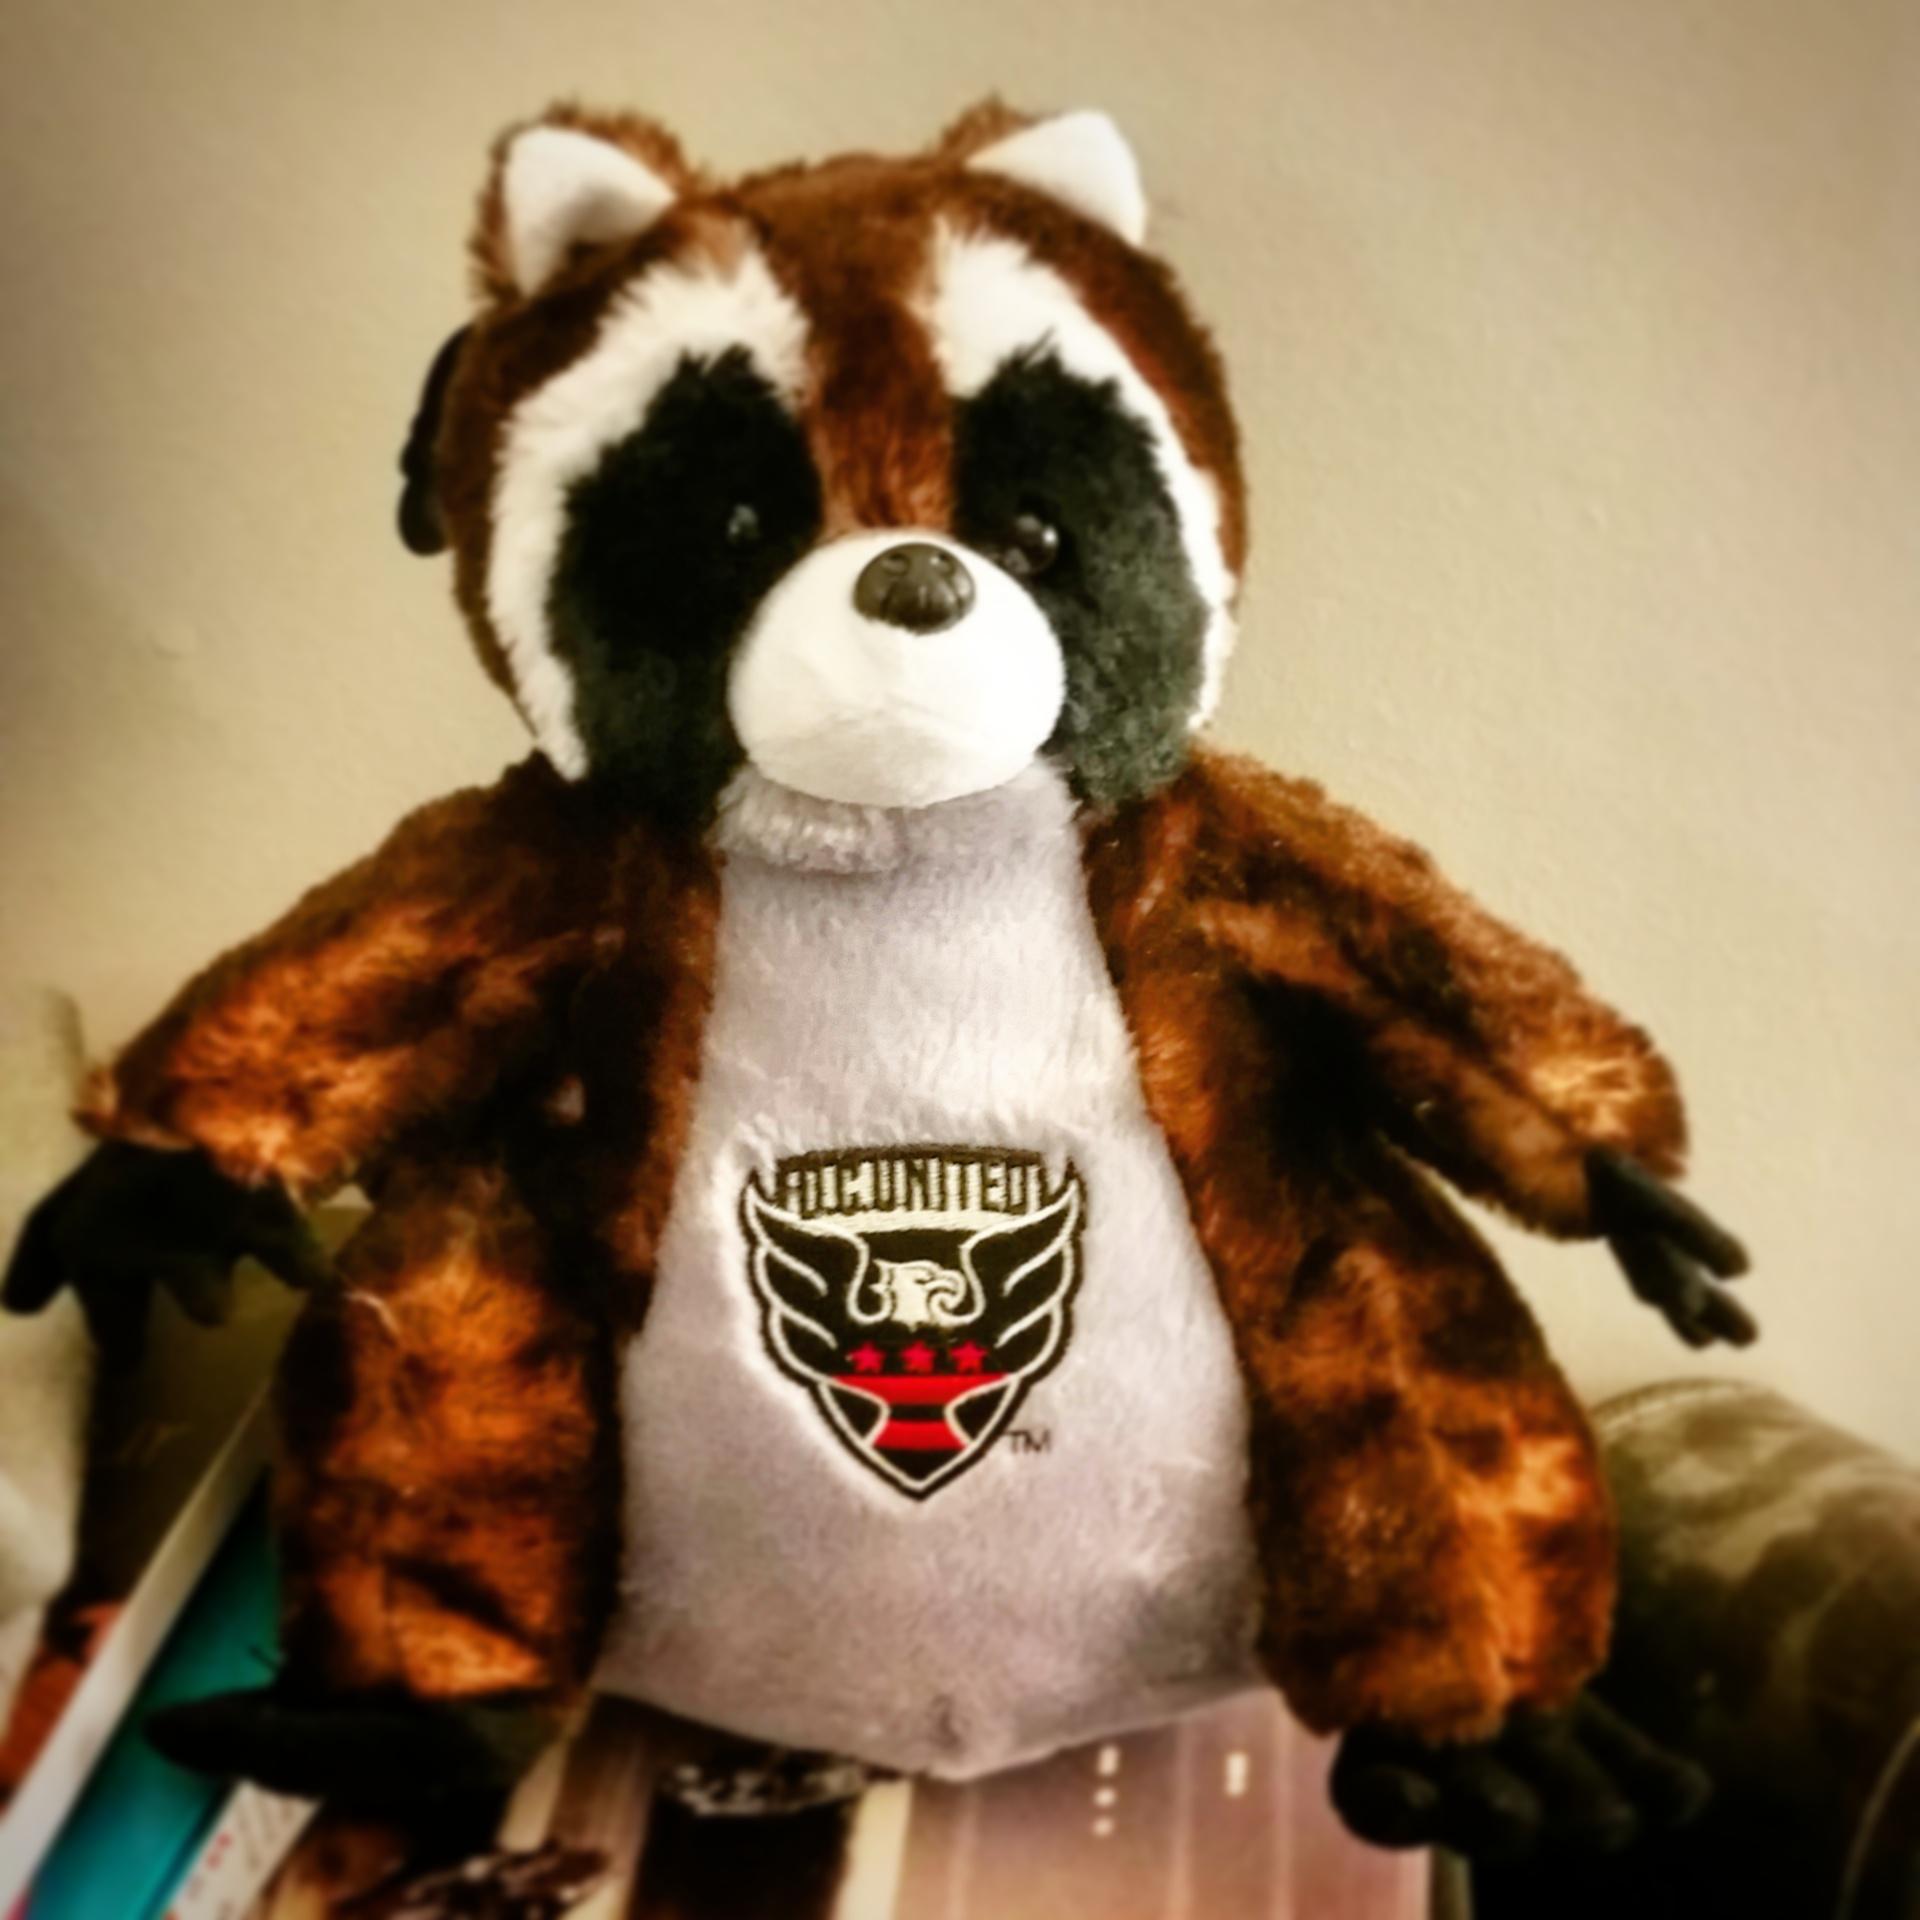 DC United raccoon